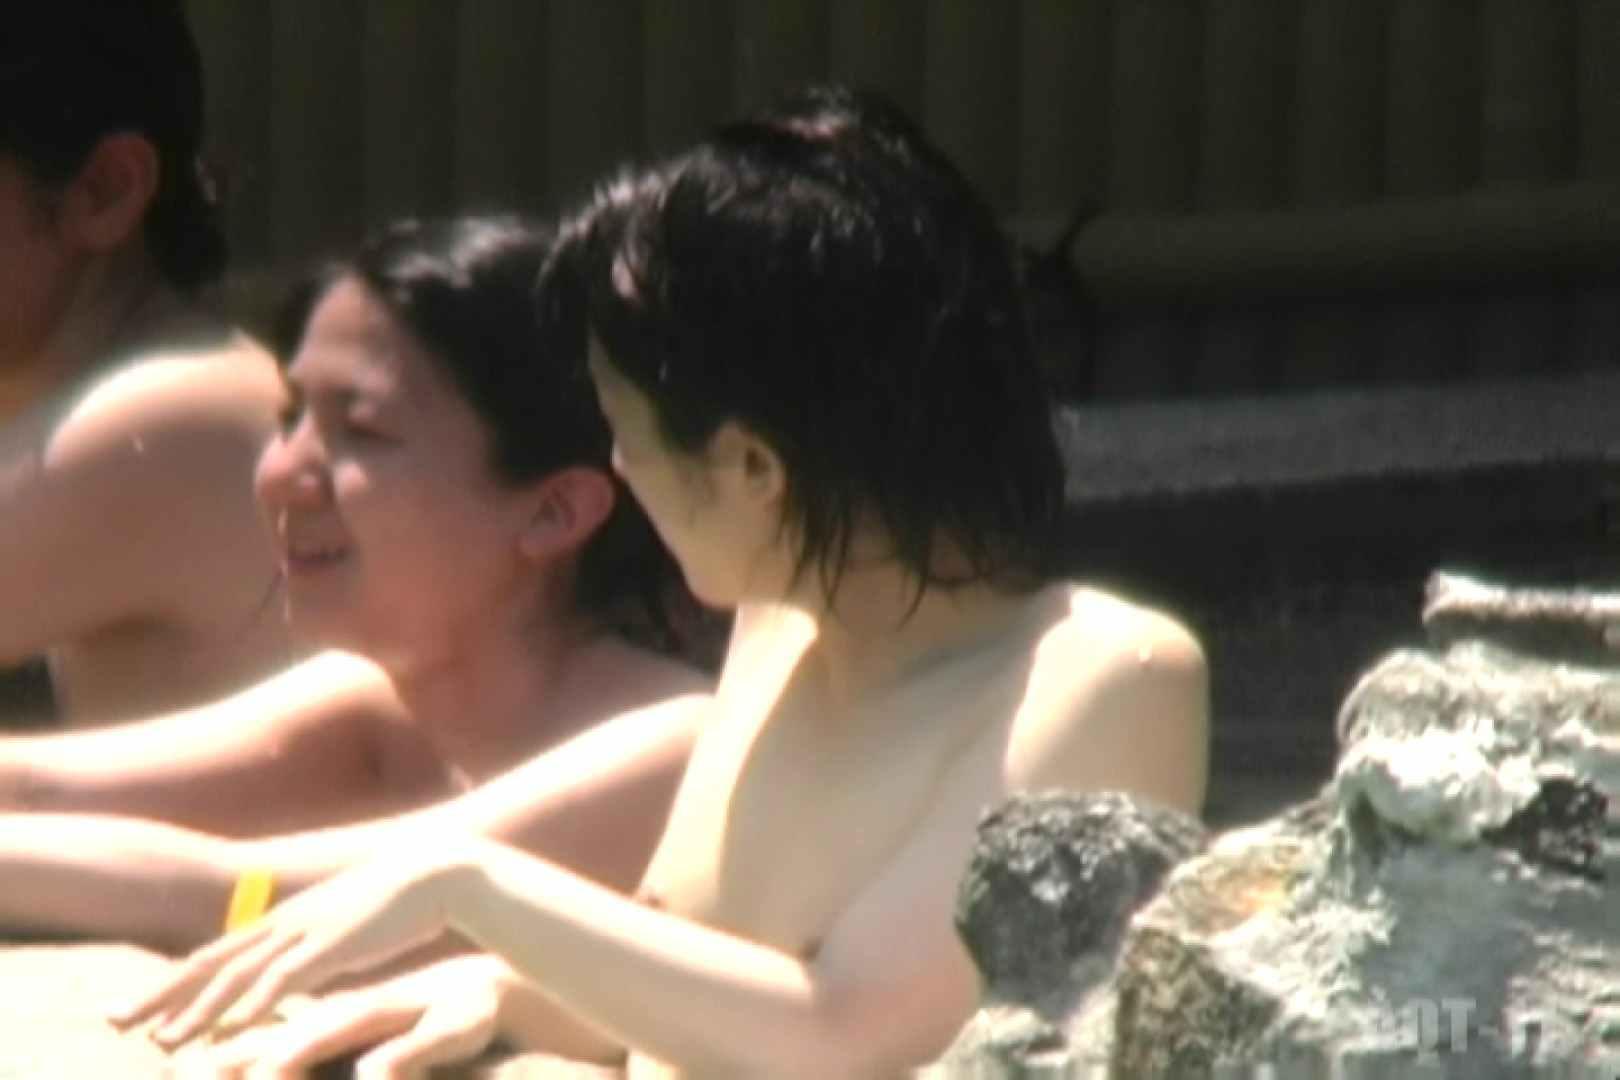 Aquaな露天風呂Vol.799 HなOL のぞき動画キャプチャ 107pic 62